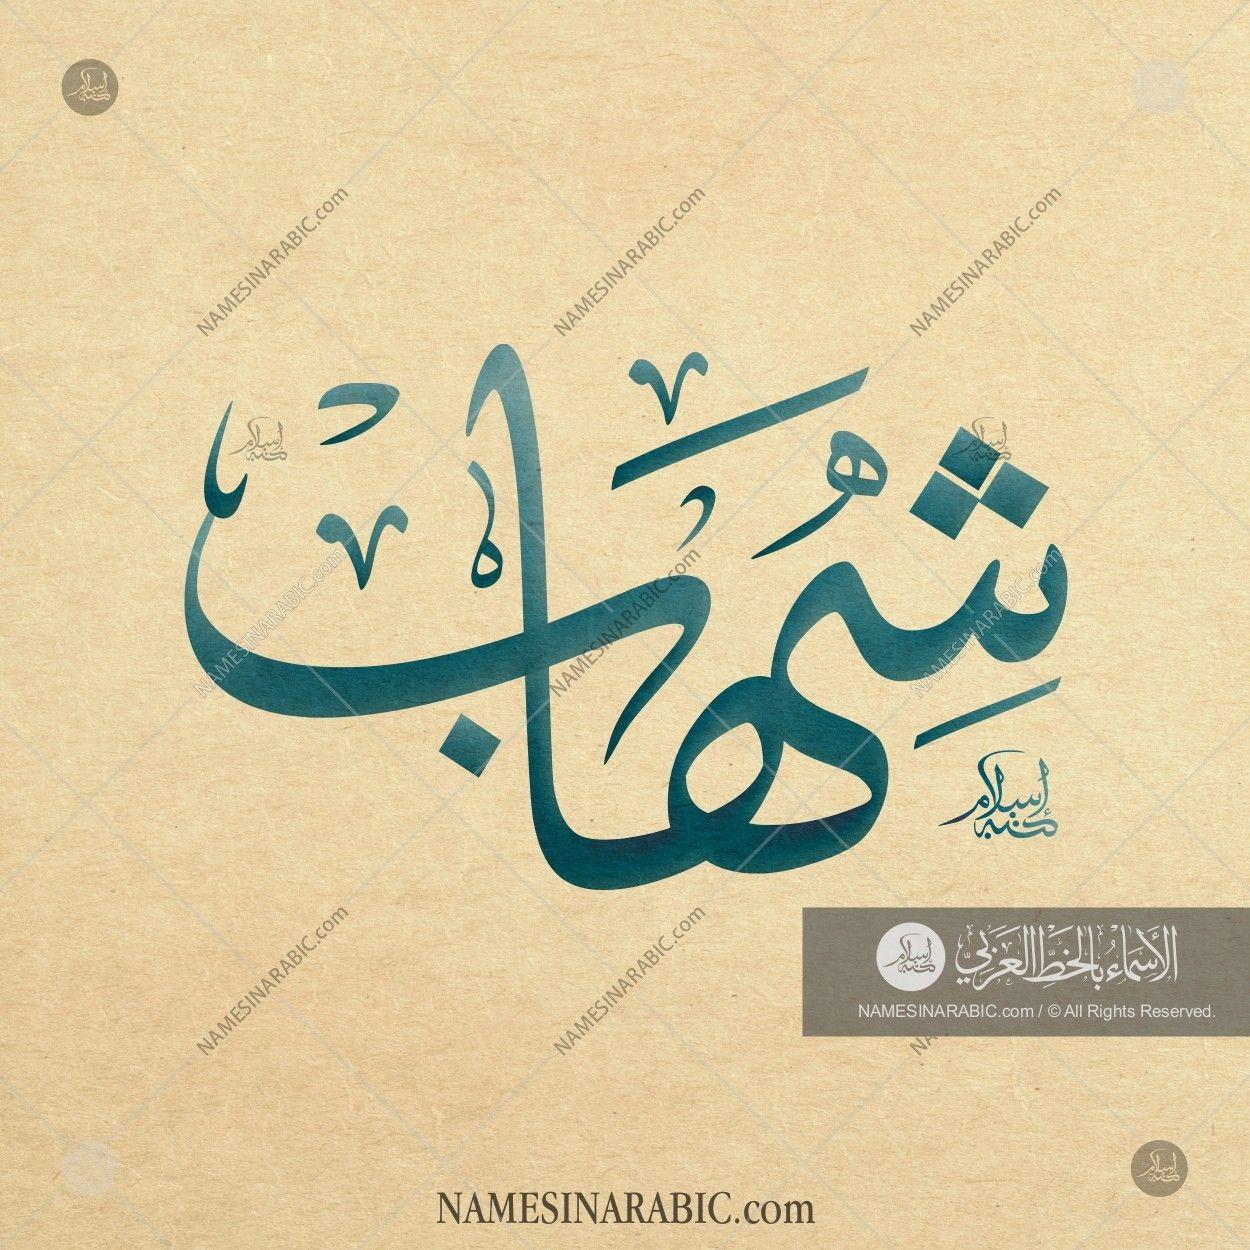 Shihab شهاب Names In Arabic Calligraphy Name 3486 Calligraphy Name Arabic Calligraphy Calligraphy